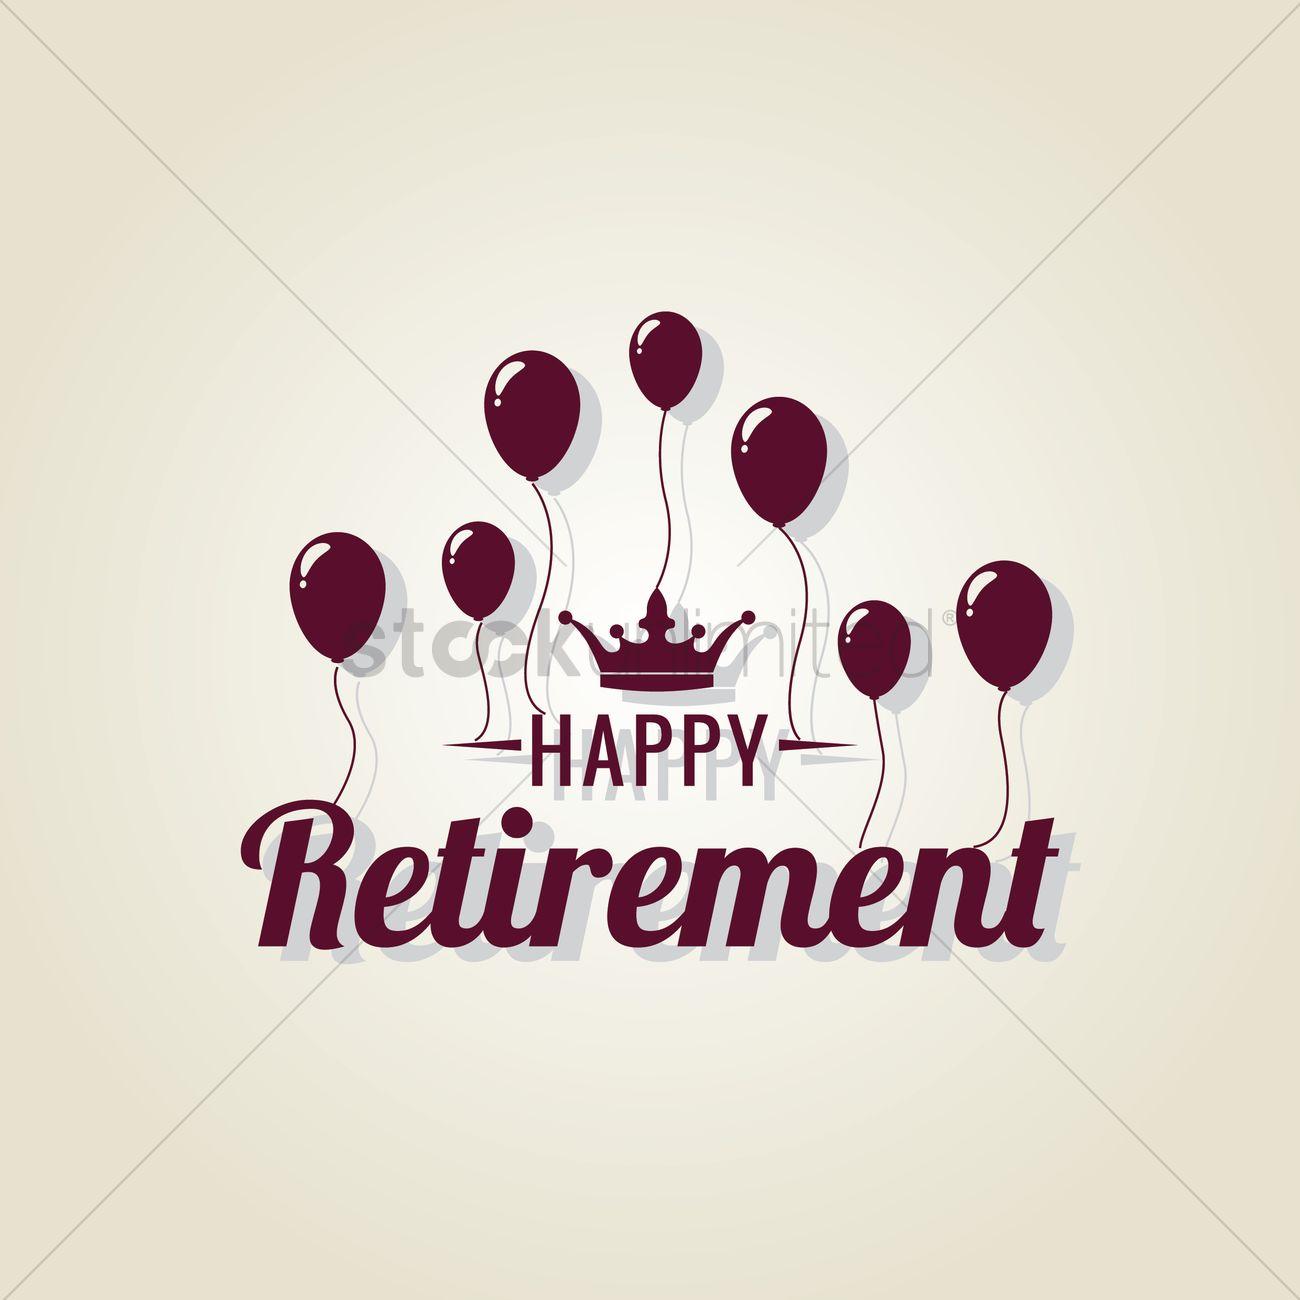 Free Happy retirement Vector Image - 1603684 | StockUnlimited